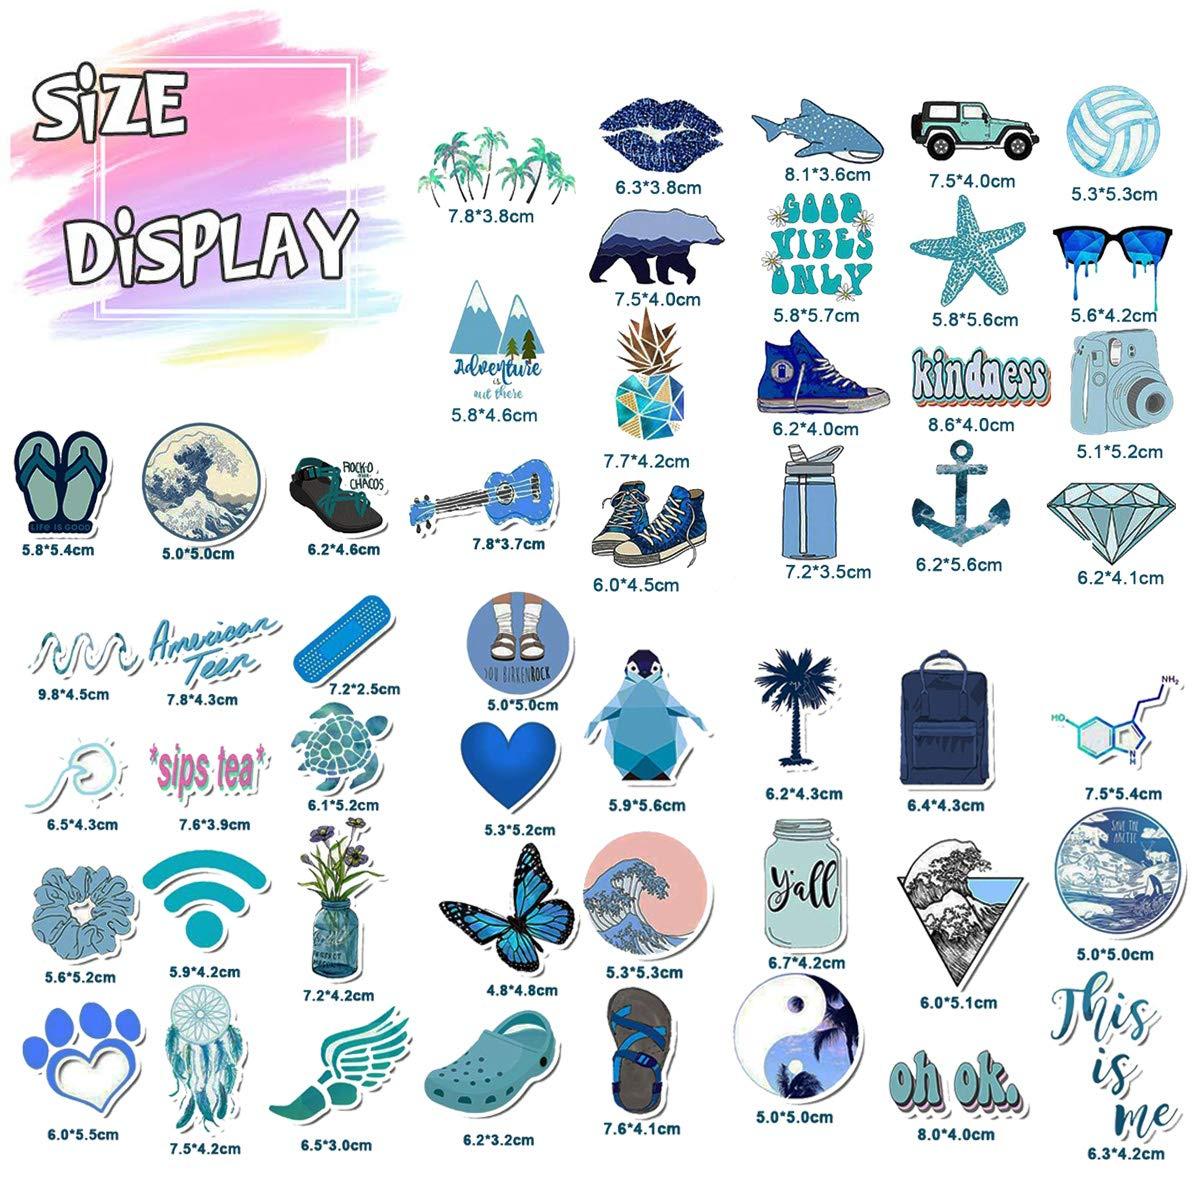 Trendy VSCO Vinyl Stickers for Laptop Water Bottles (50-Pack) Cute Aesthetic Waterproof Stickers for Hydro Flask Phone Skateboard Guitar, Suitable for Girls, Kids, Teens, Adults (Blue Series)